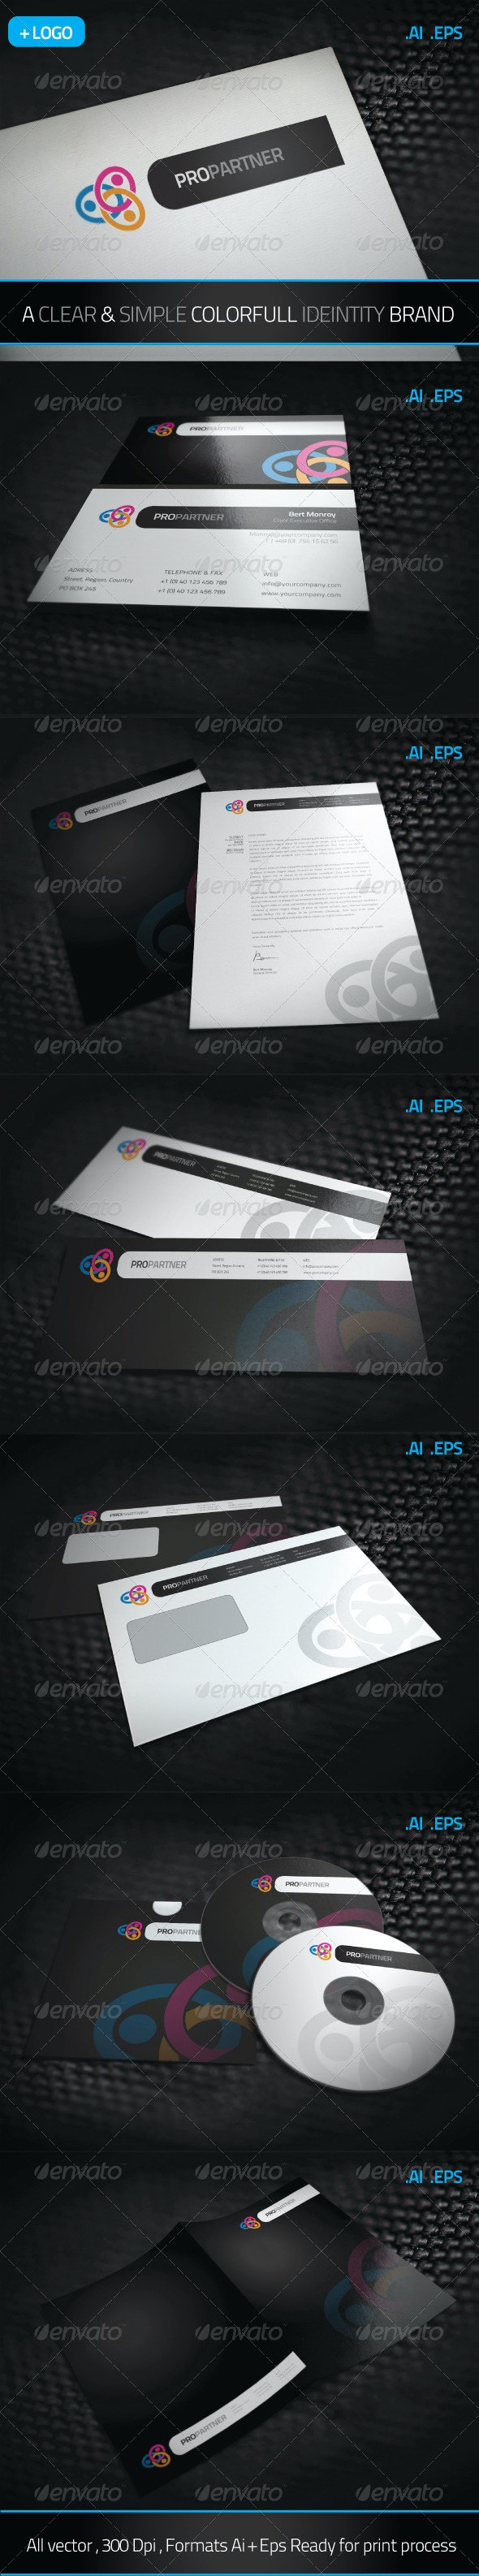 Pro Partners - Stationery Print Templates